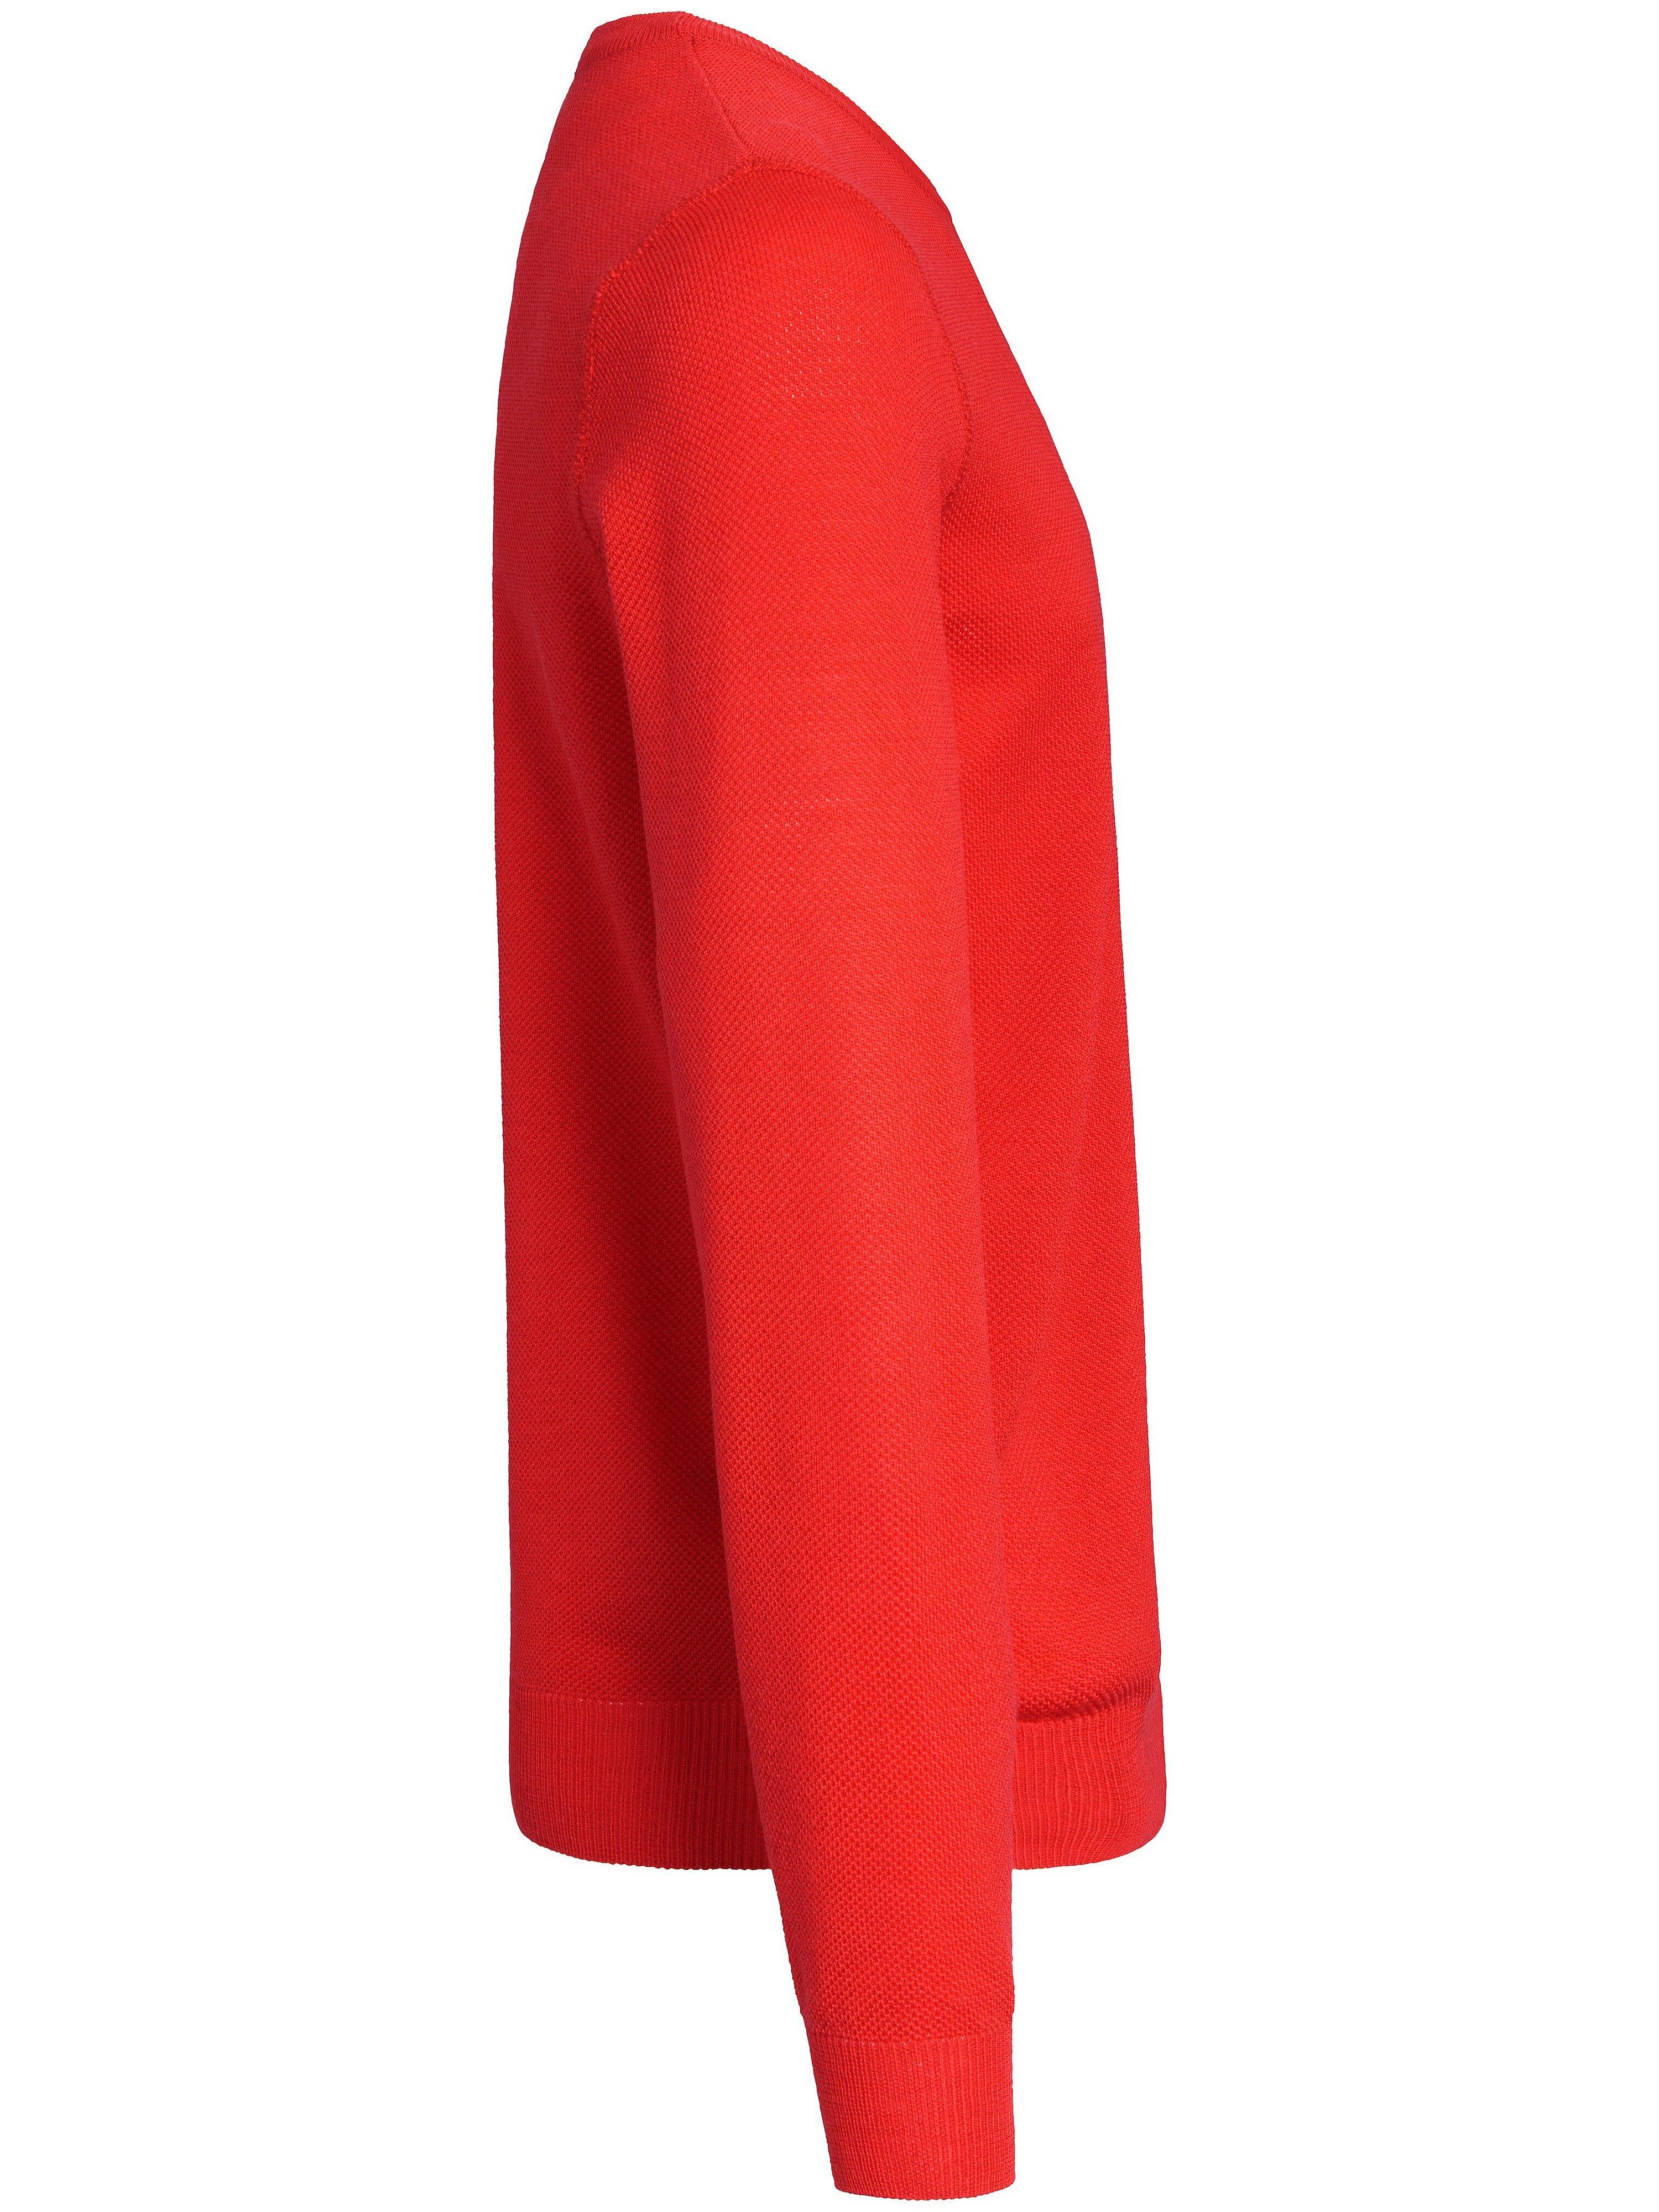 Strikbluse i 100% ren ny uld Fra Louis Sayn rød